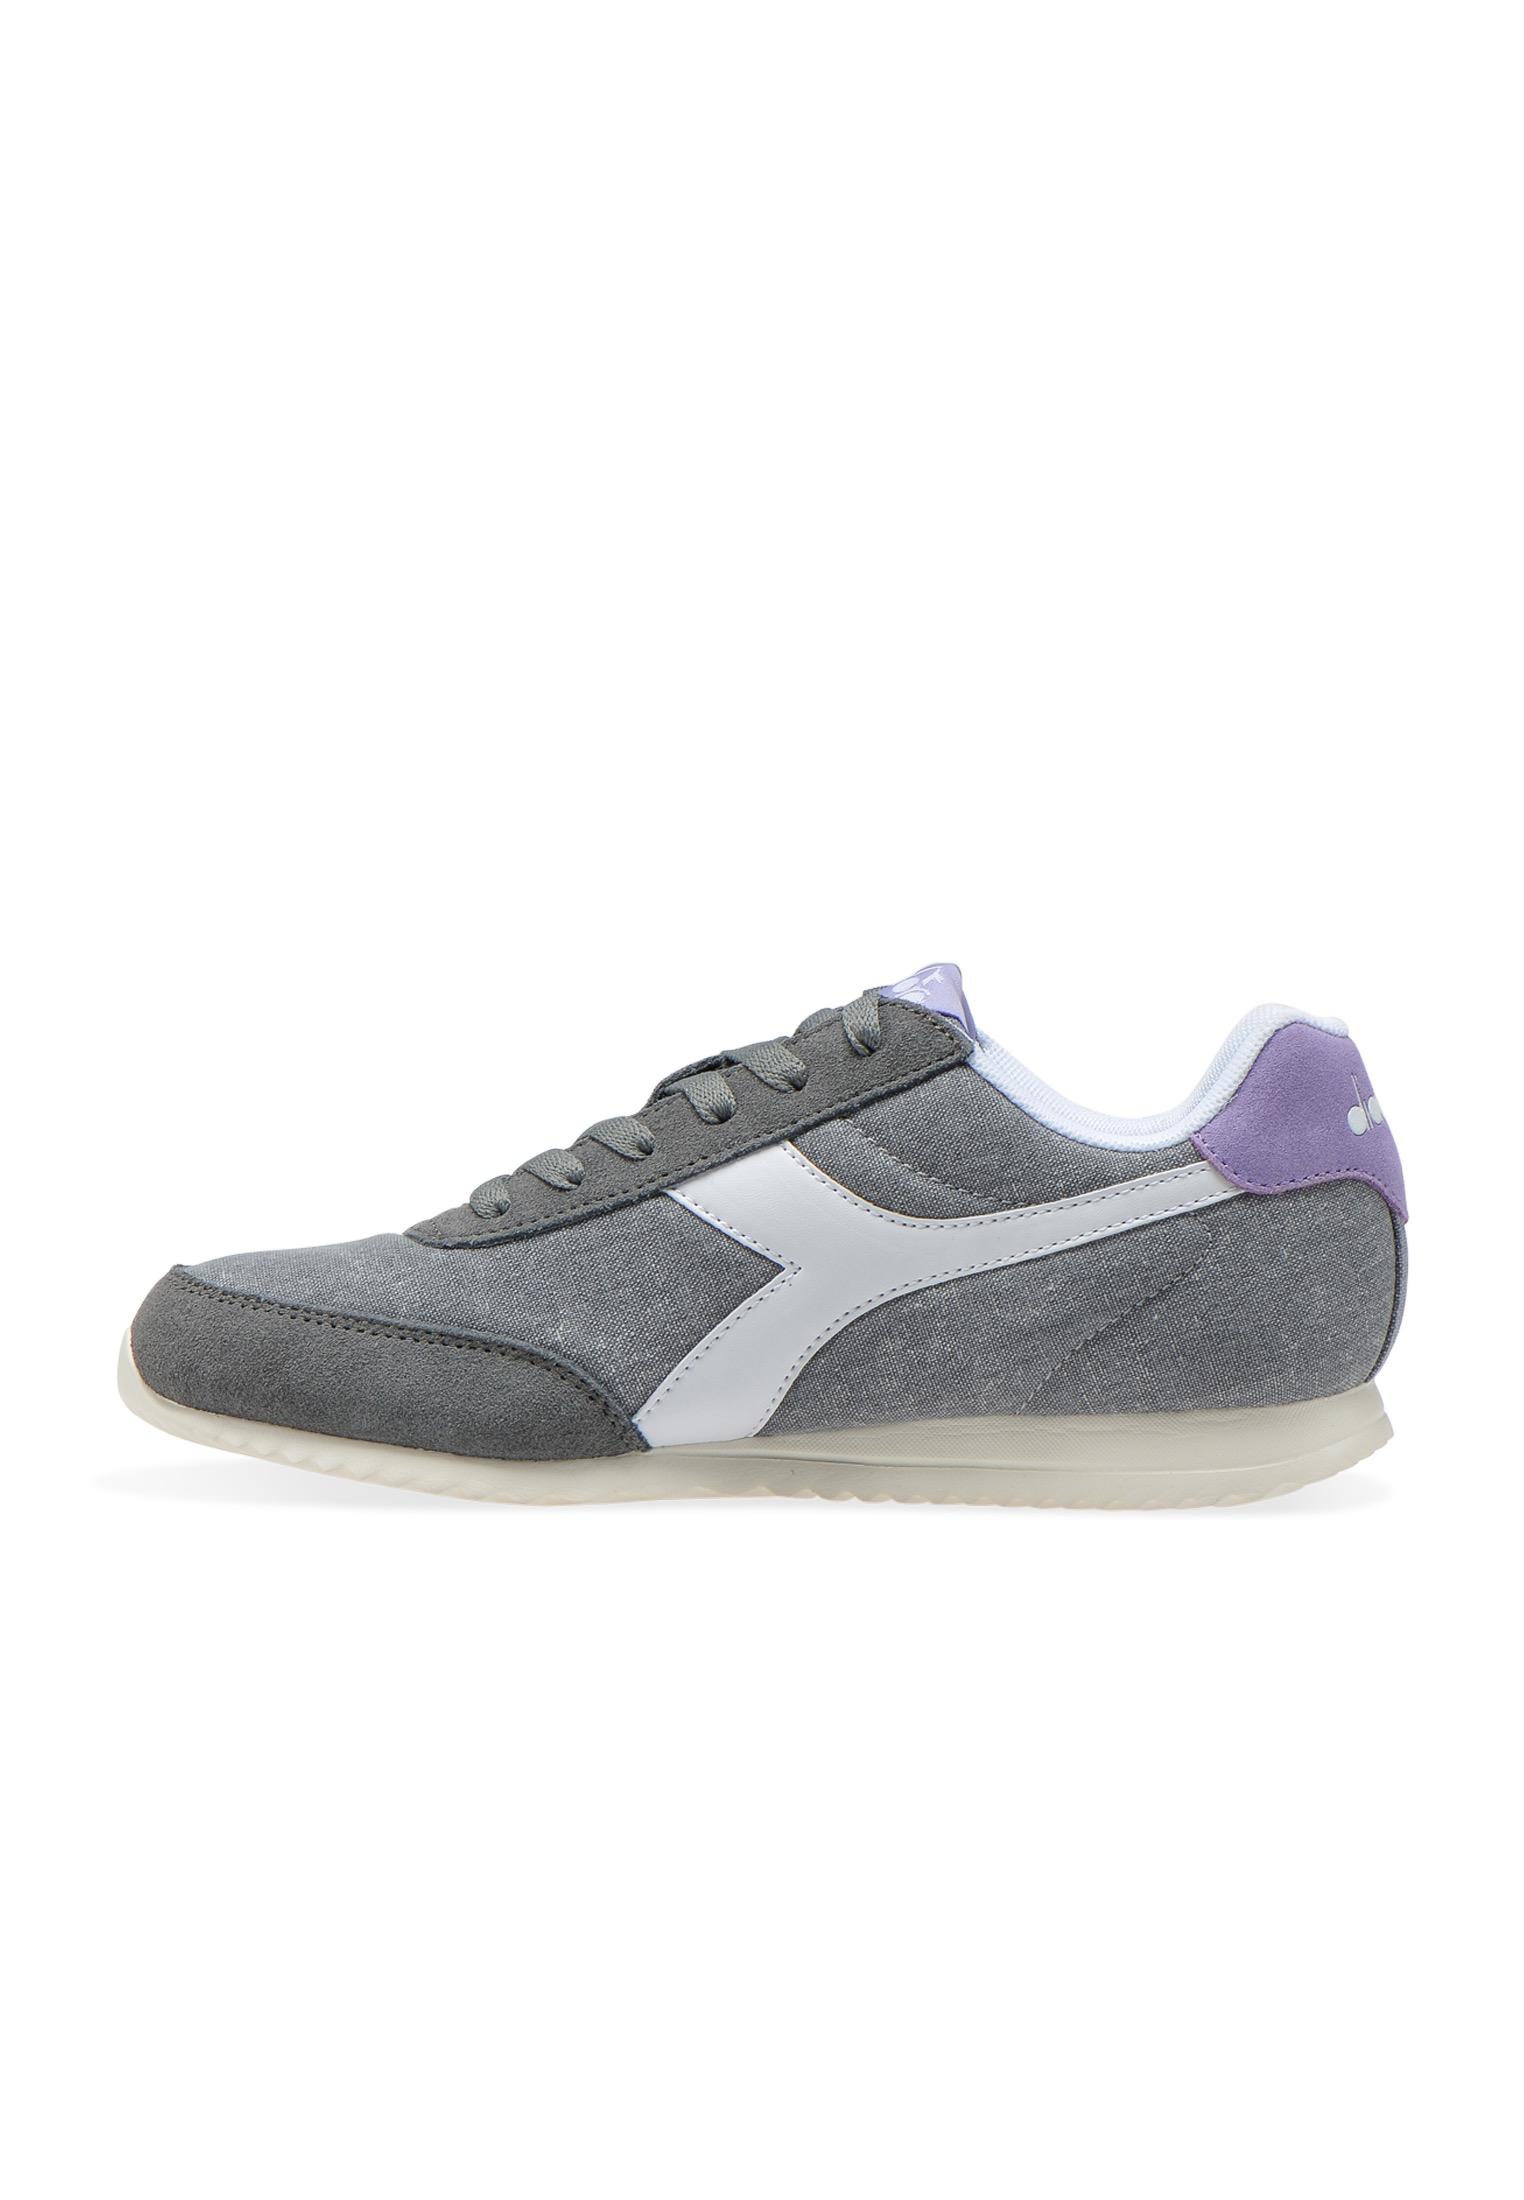 Scarpe-Diadora-Jog-Light-C-Sneakers-sportive-uomo-donna-vari-colori-e-taglie miniatura 81